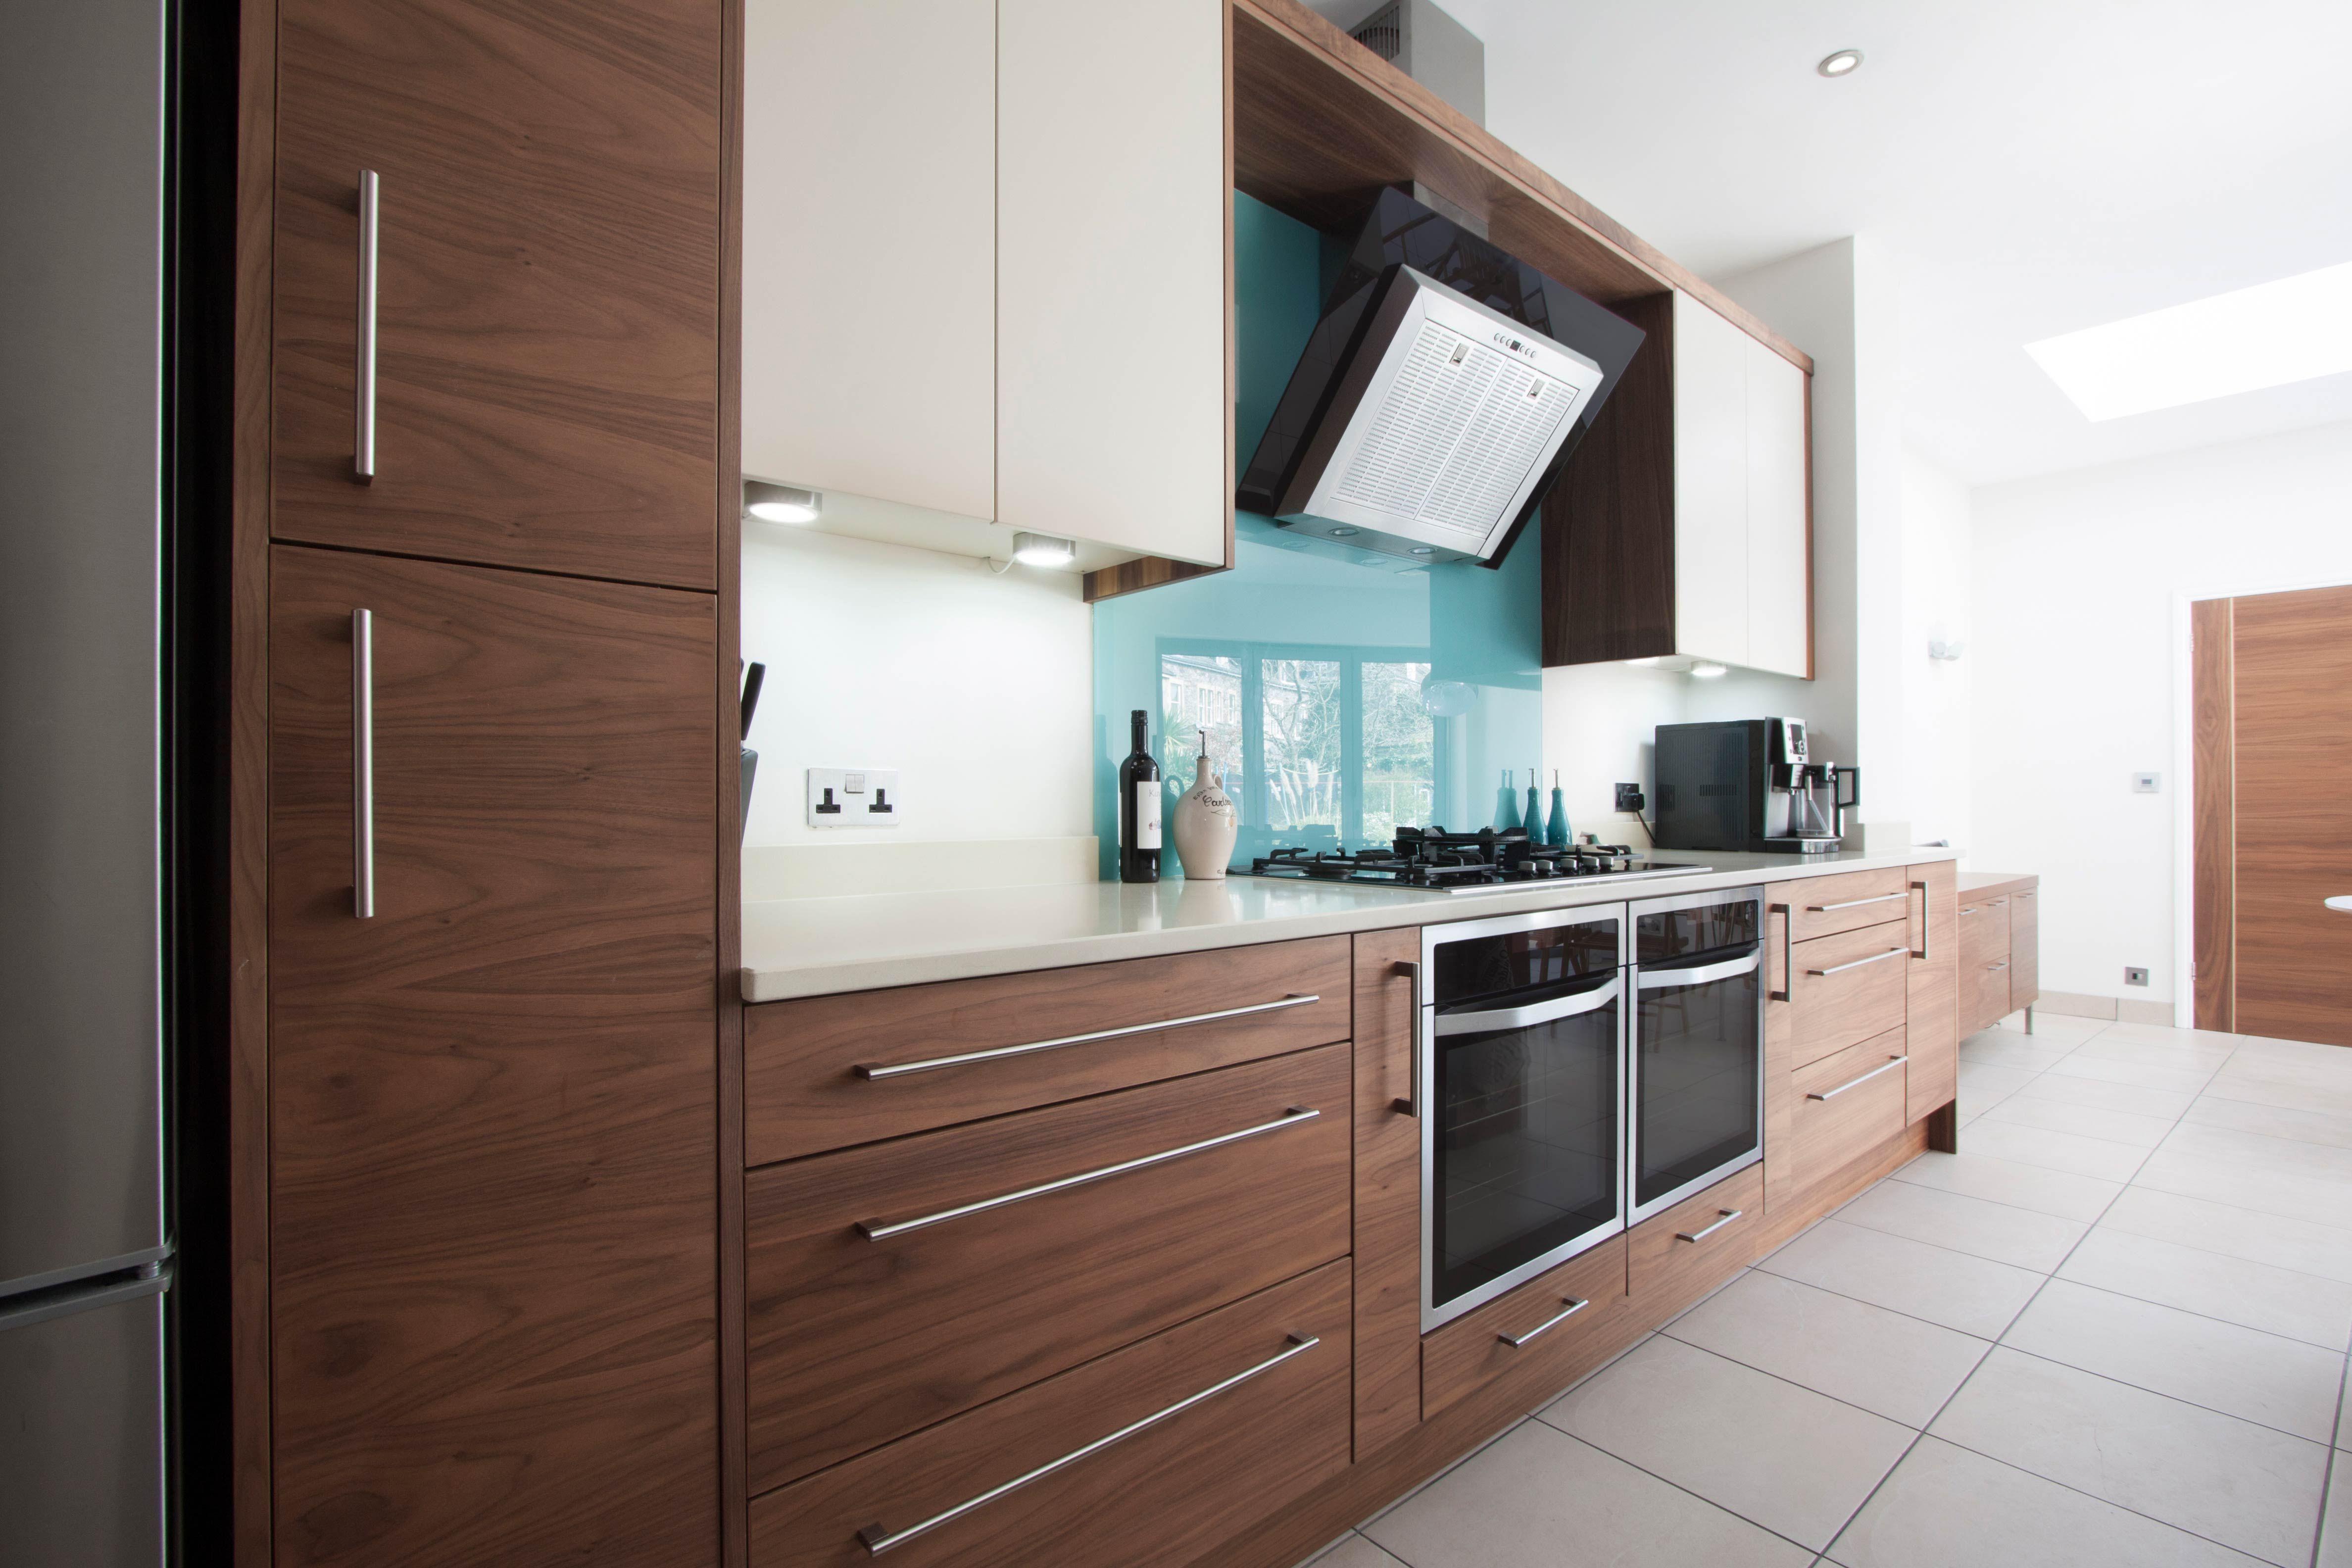 Number eighty one veneered walnut lacquered flat slab kitchen door with arenastone